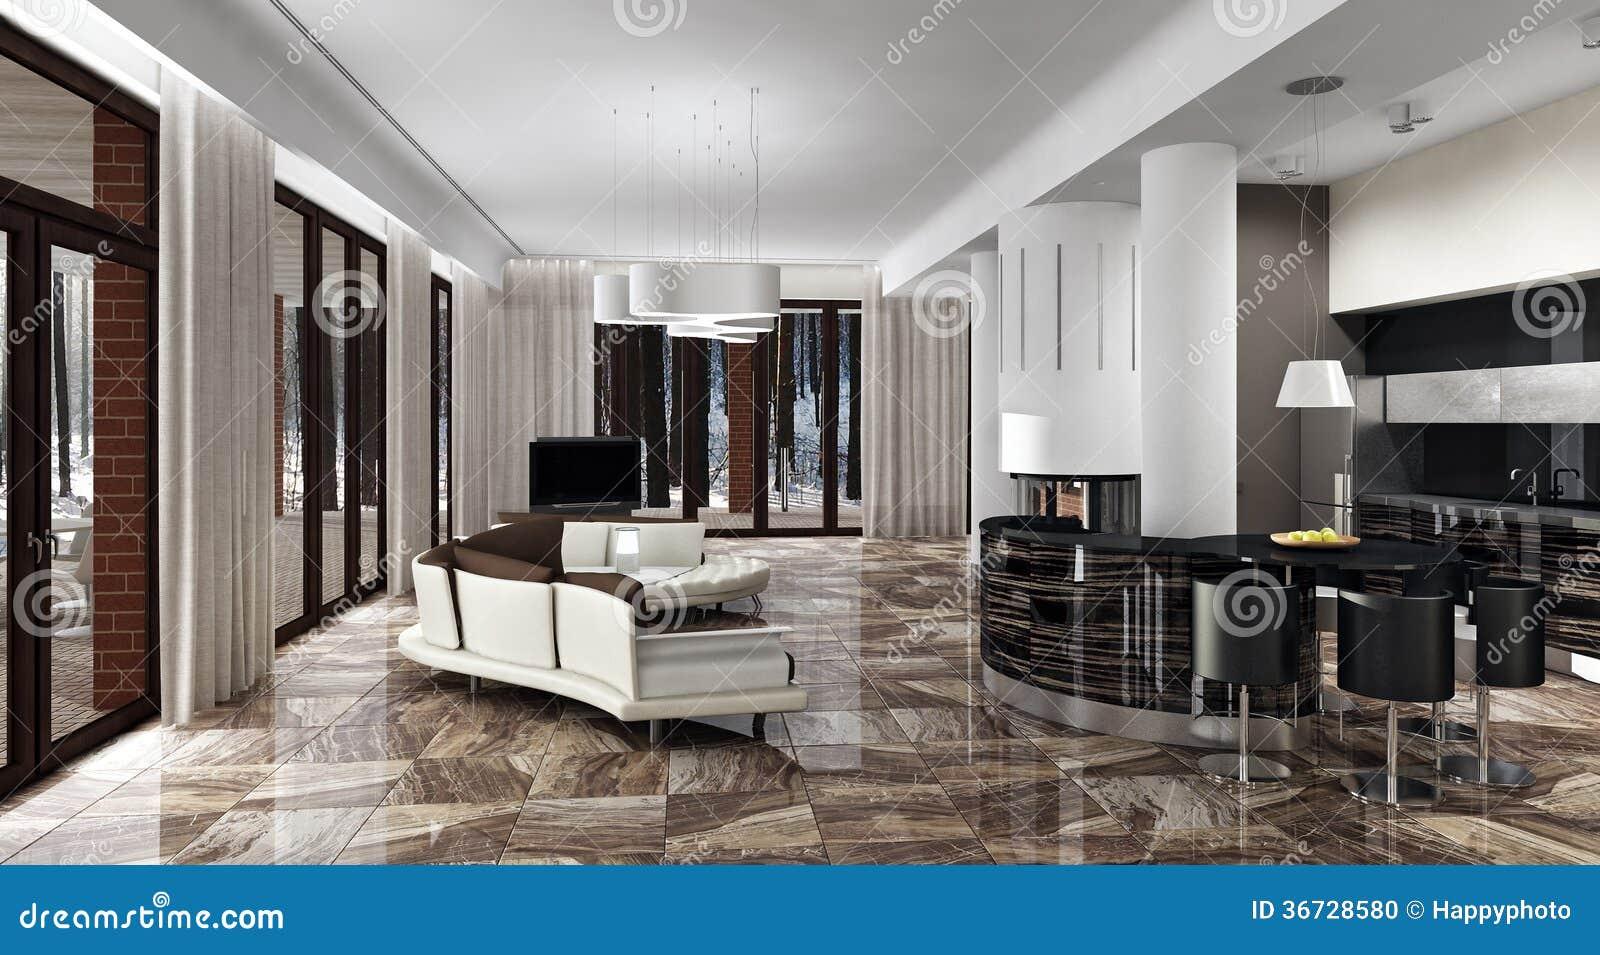 Daglicht Je Keuken : Luxe licht binnenland in daglicht stock illustratie illustratie